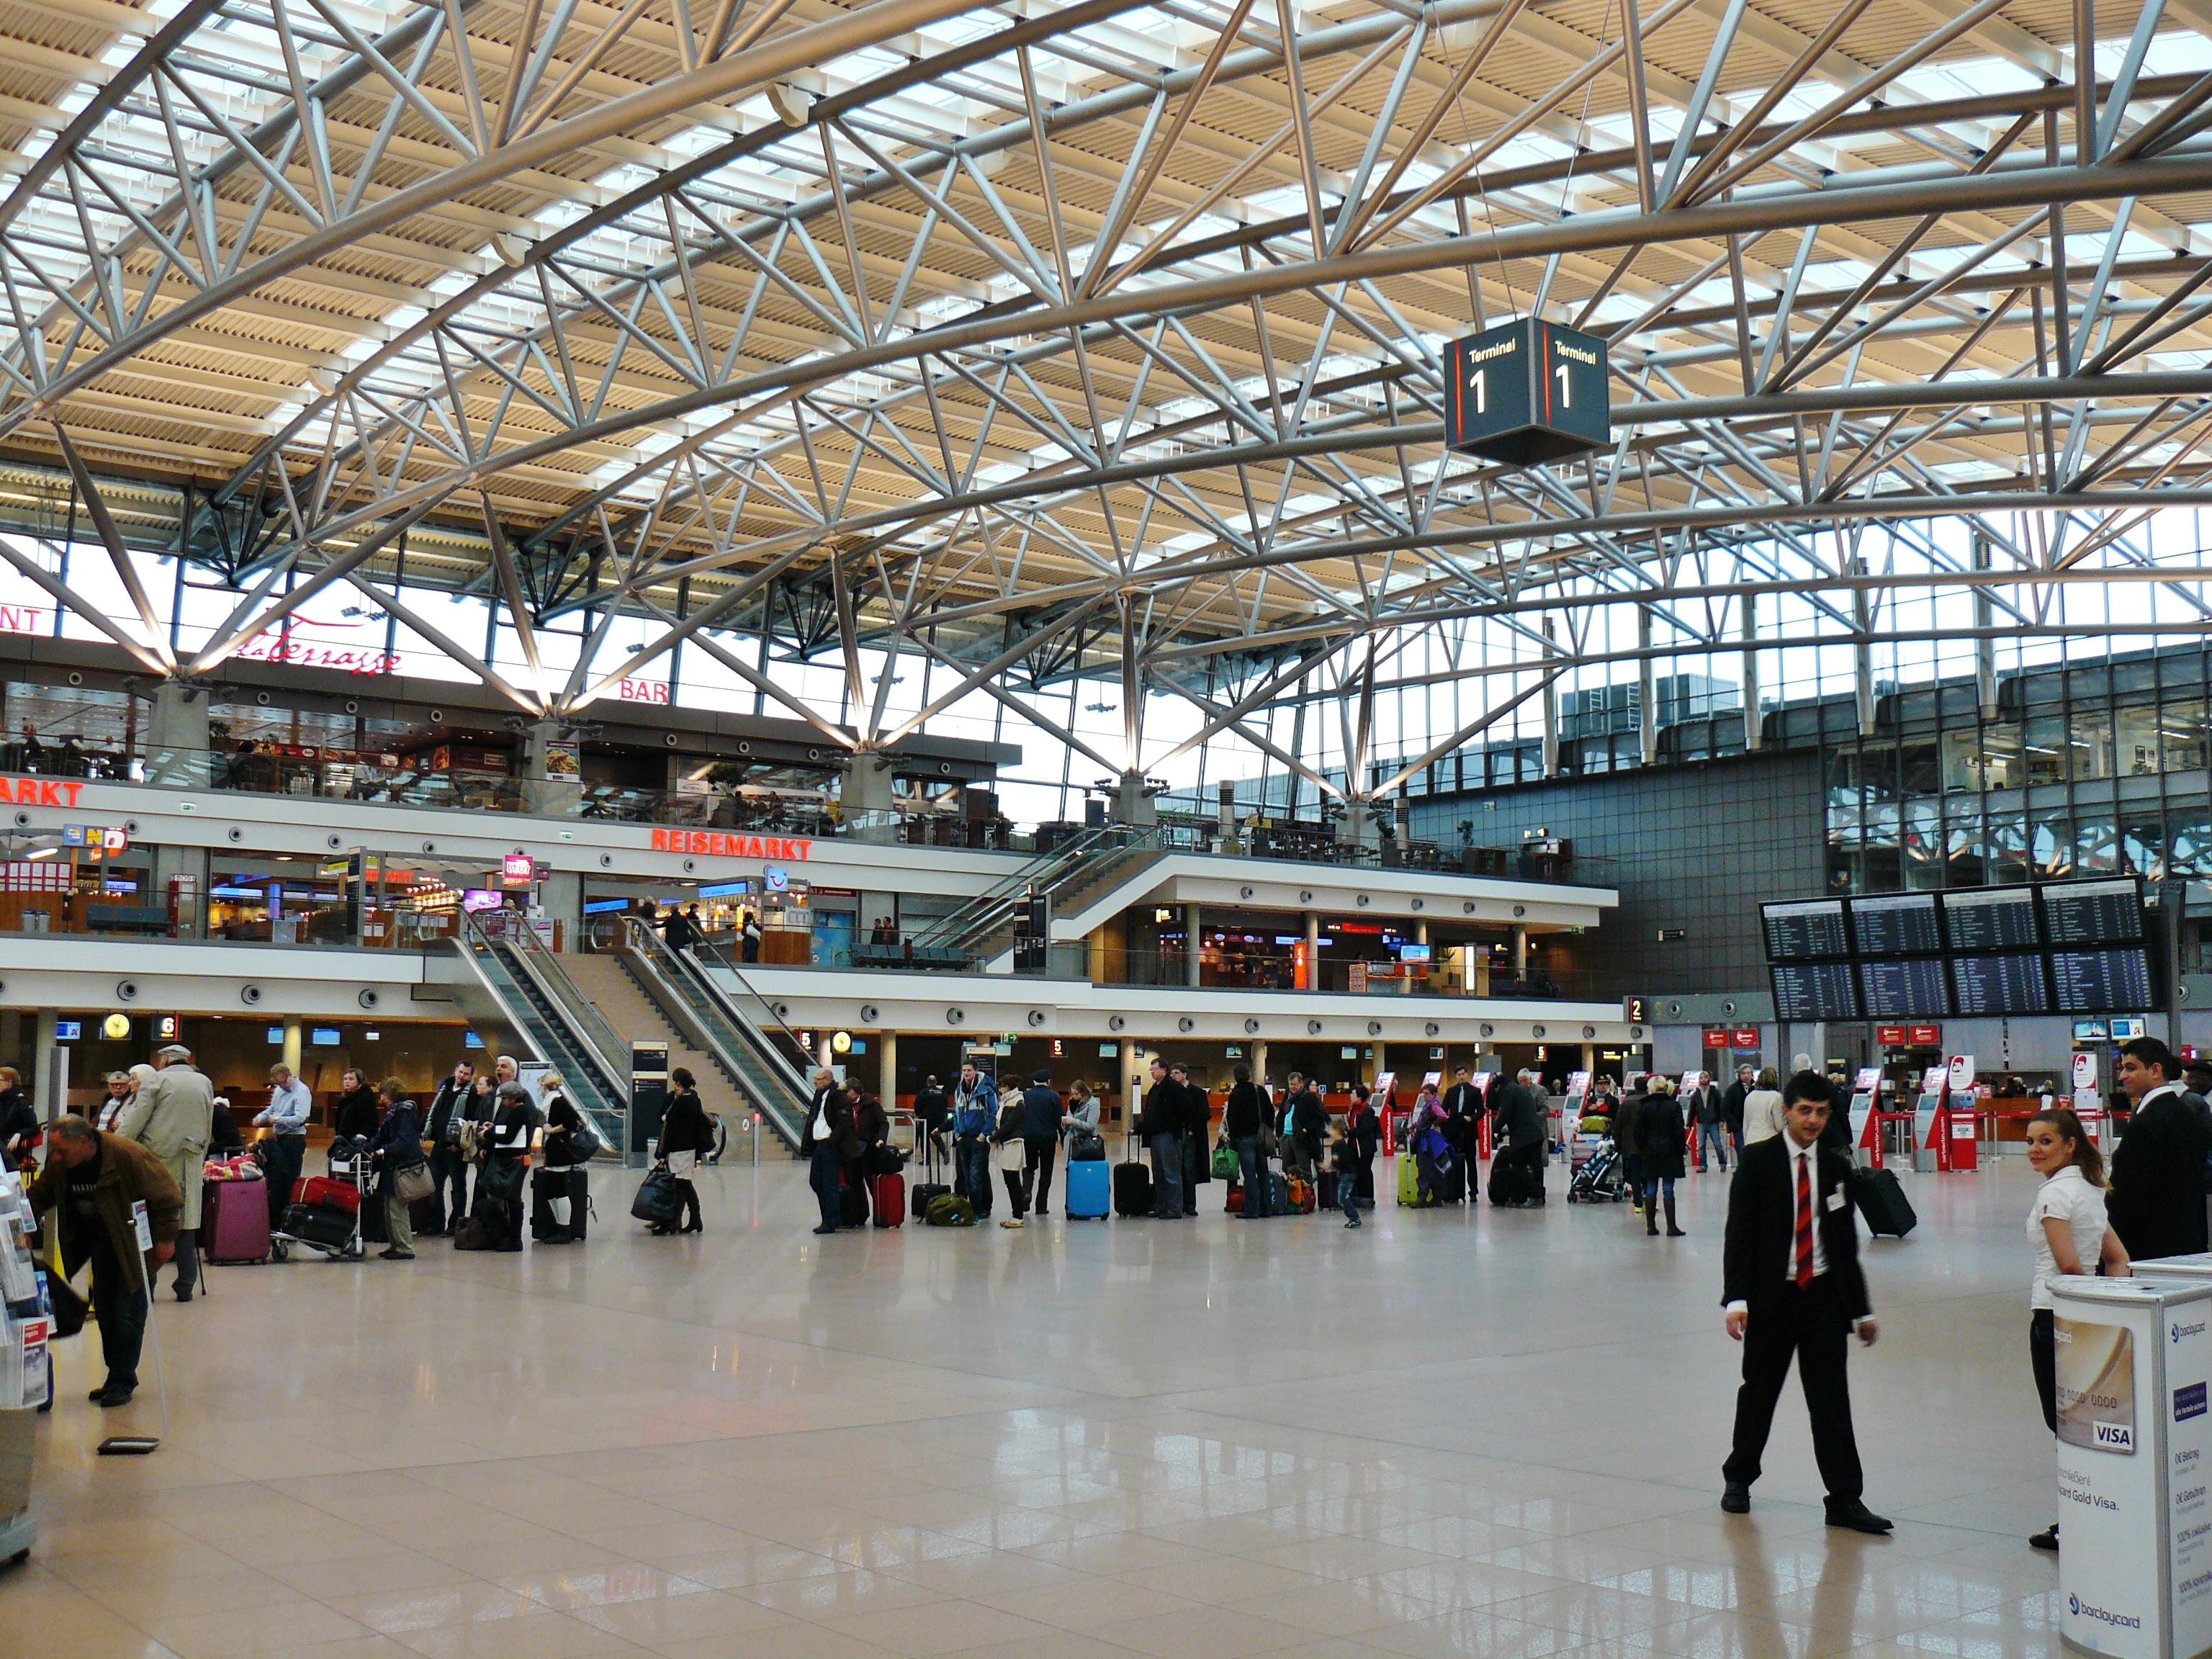 Fuhlsbuettel Airport